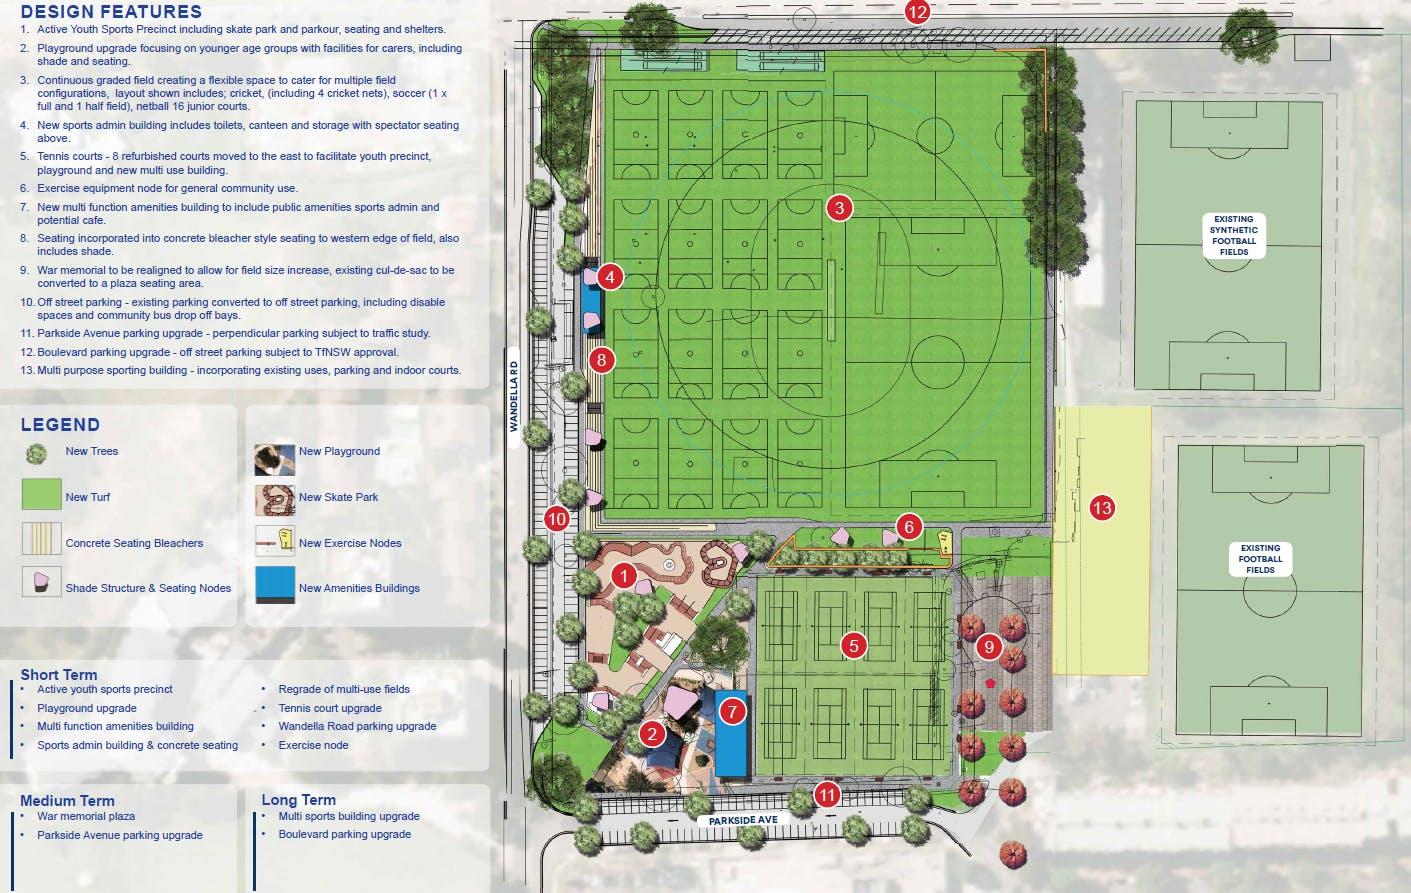 July 2021 Seymour Shaw draft masterplan image.PNG